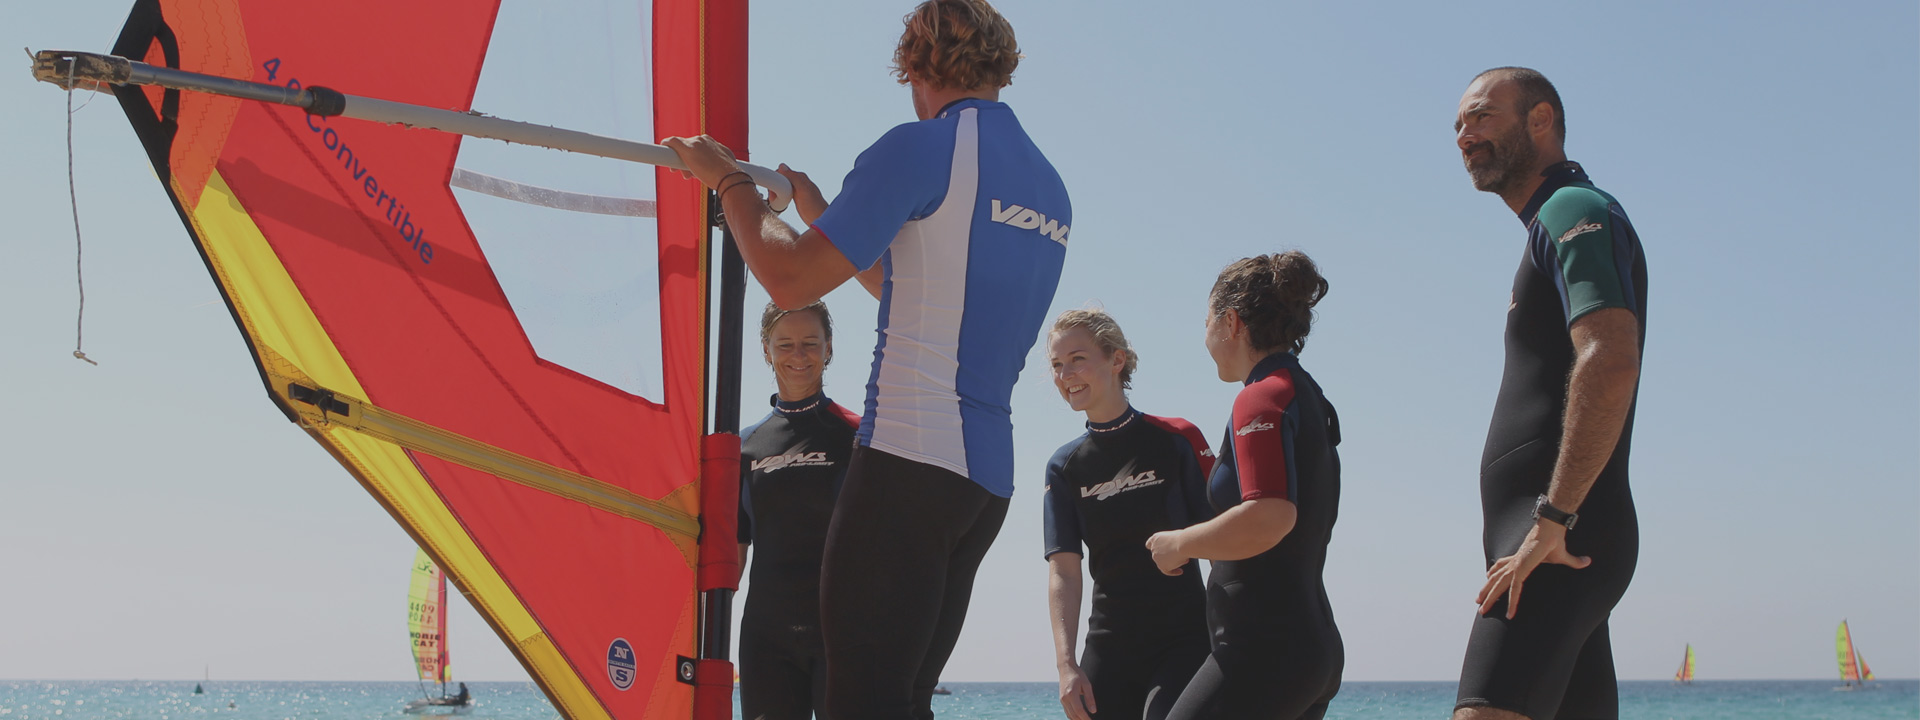 djerba-windsurfen-vdws